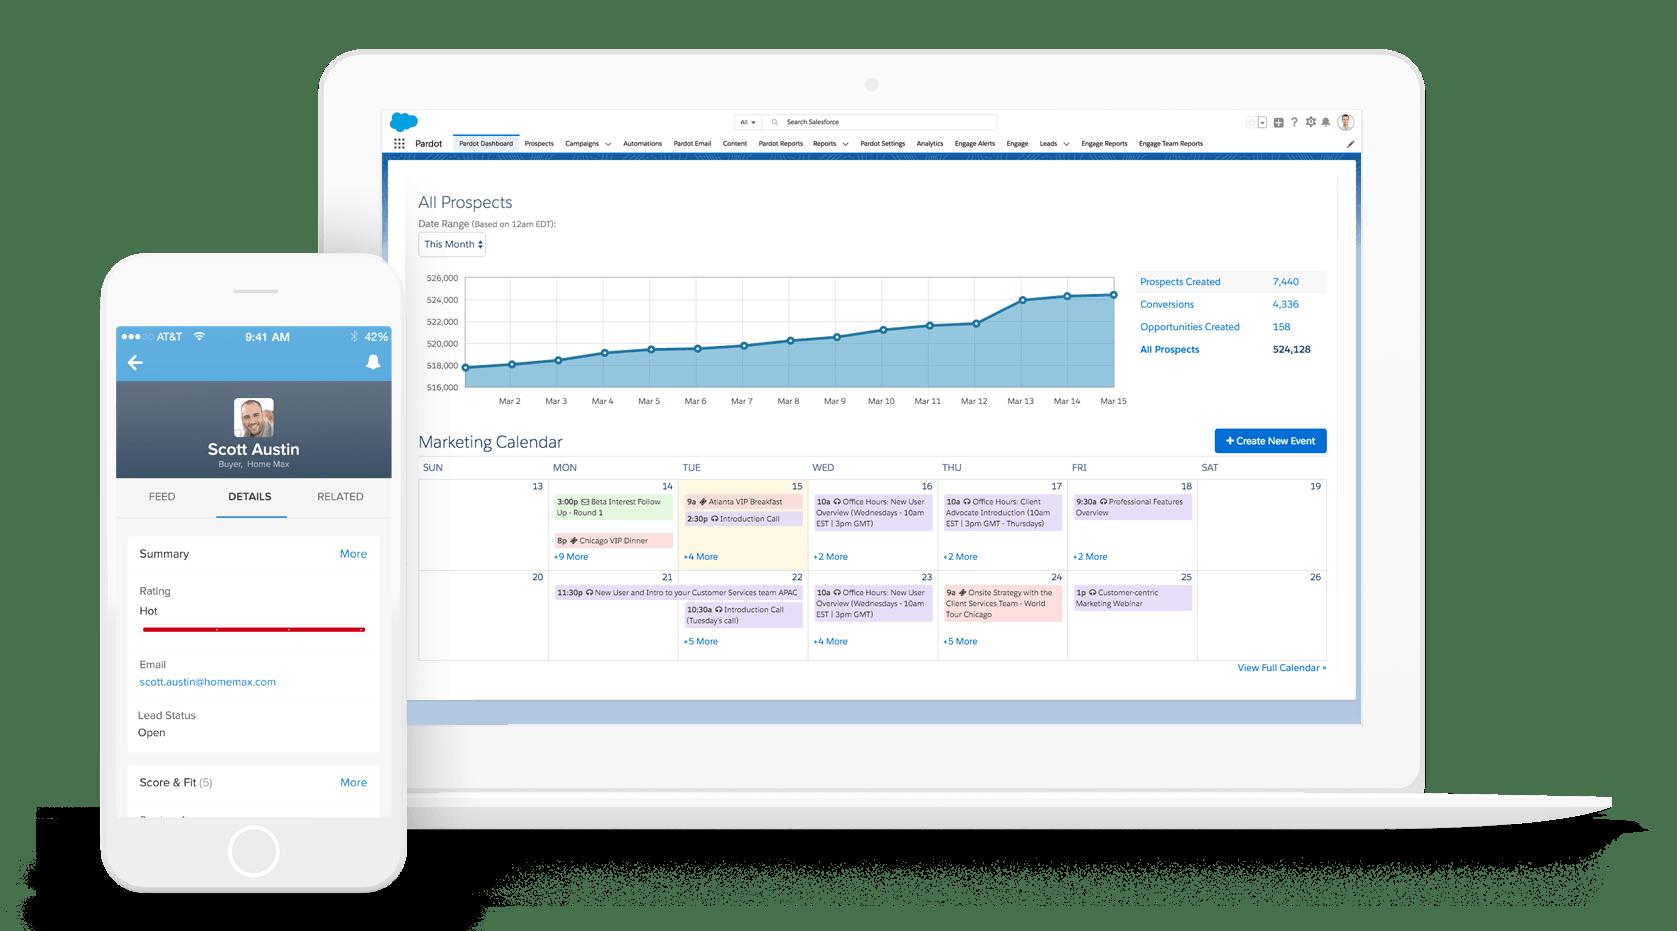 B2B Marketing Automation and Lead Nurturing Tools - Salesforce.com